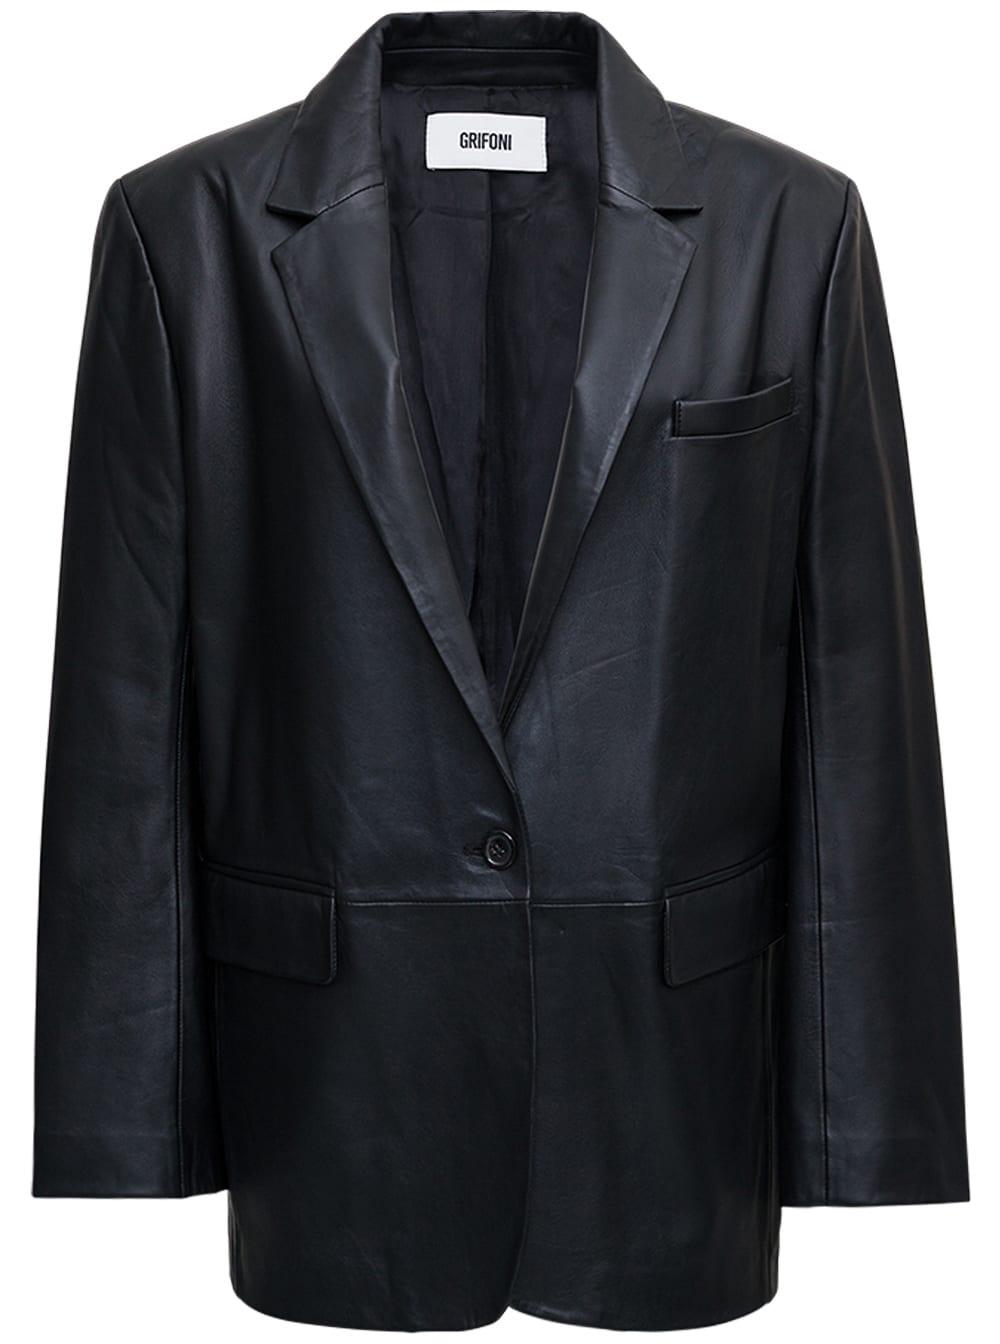 Single-breasted Black Leather Jacket